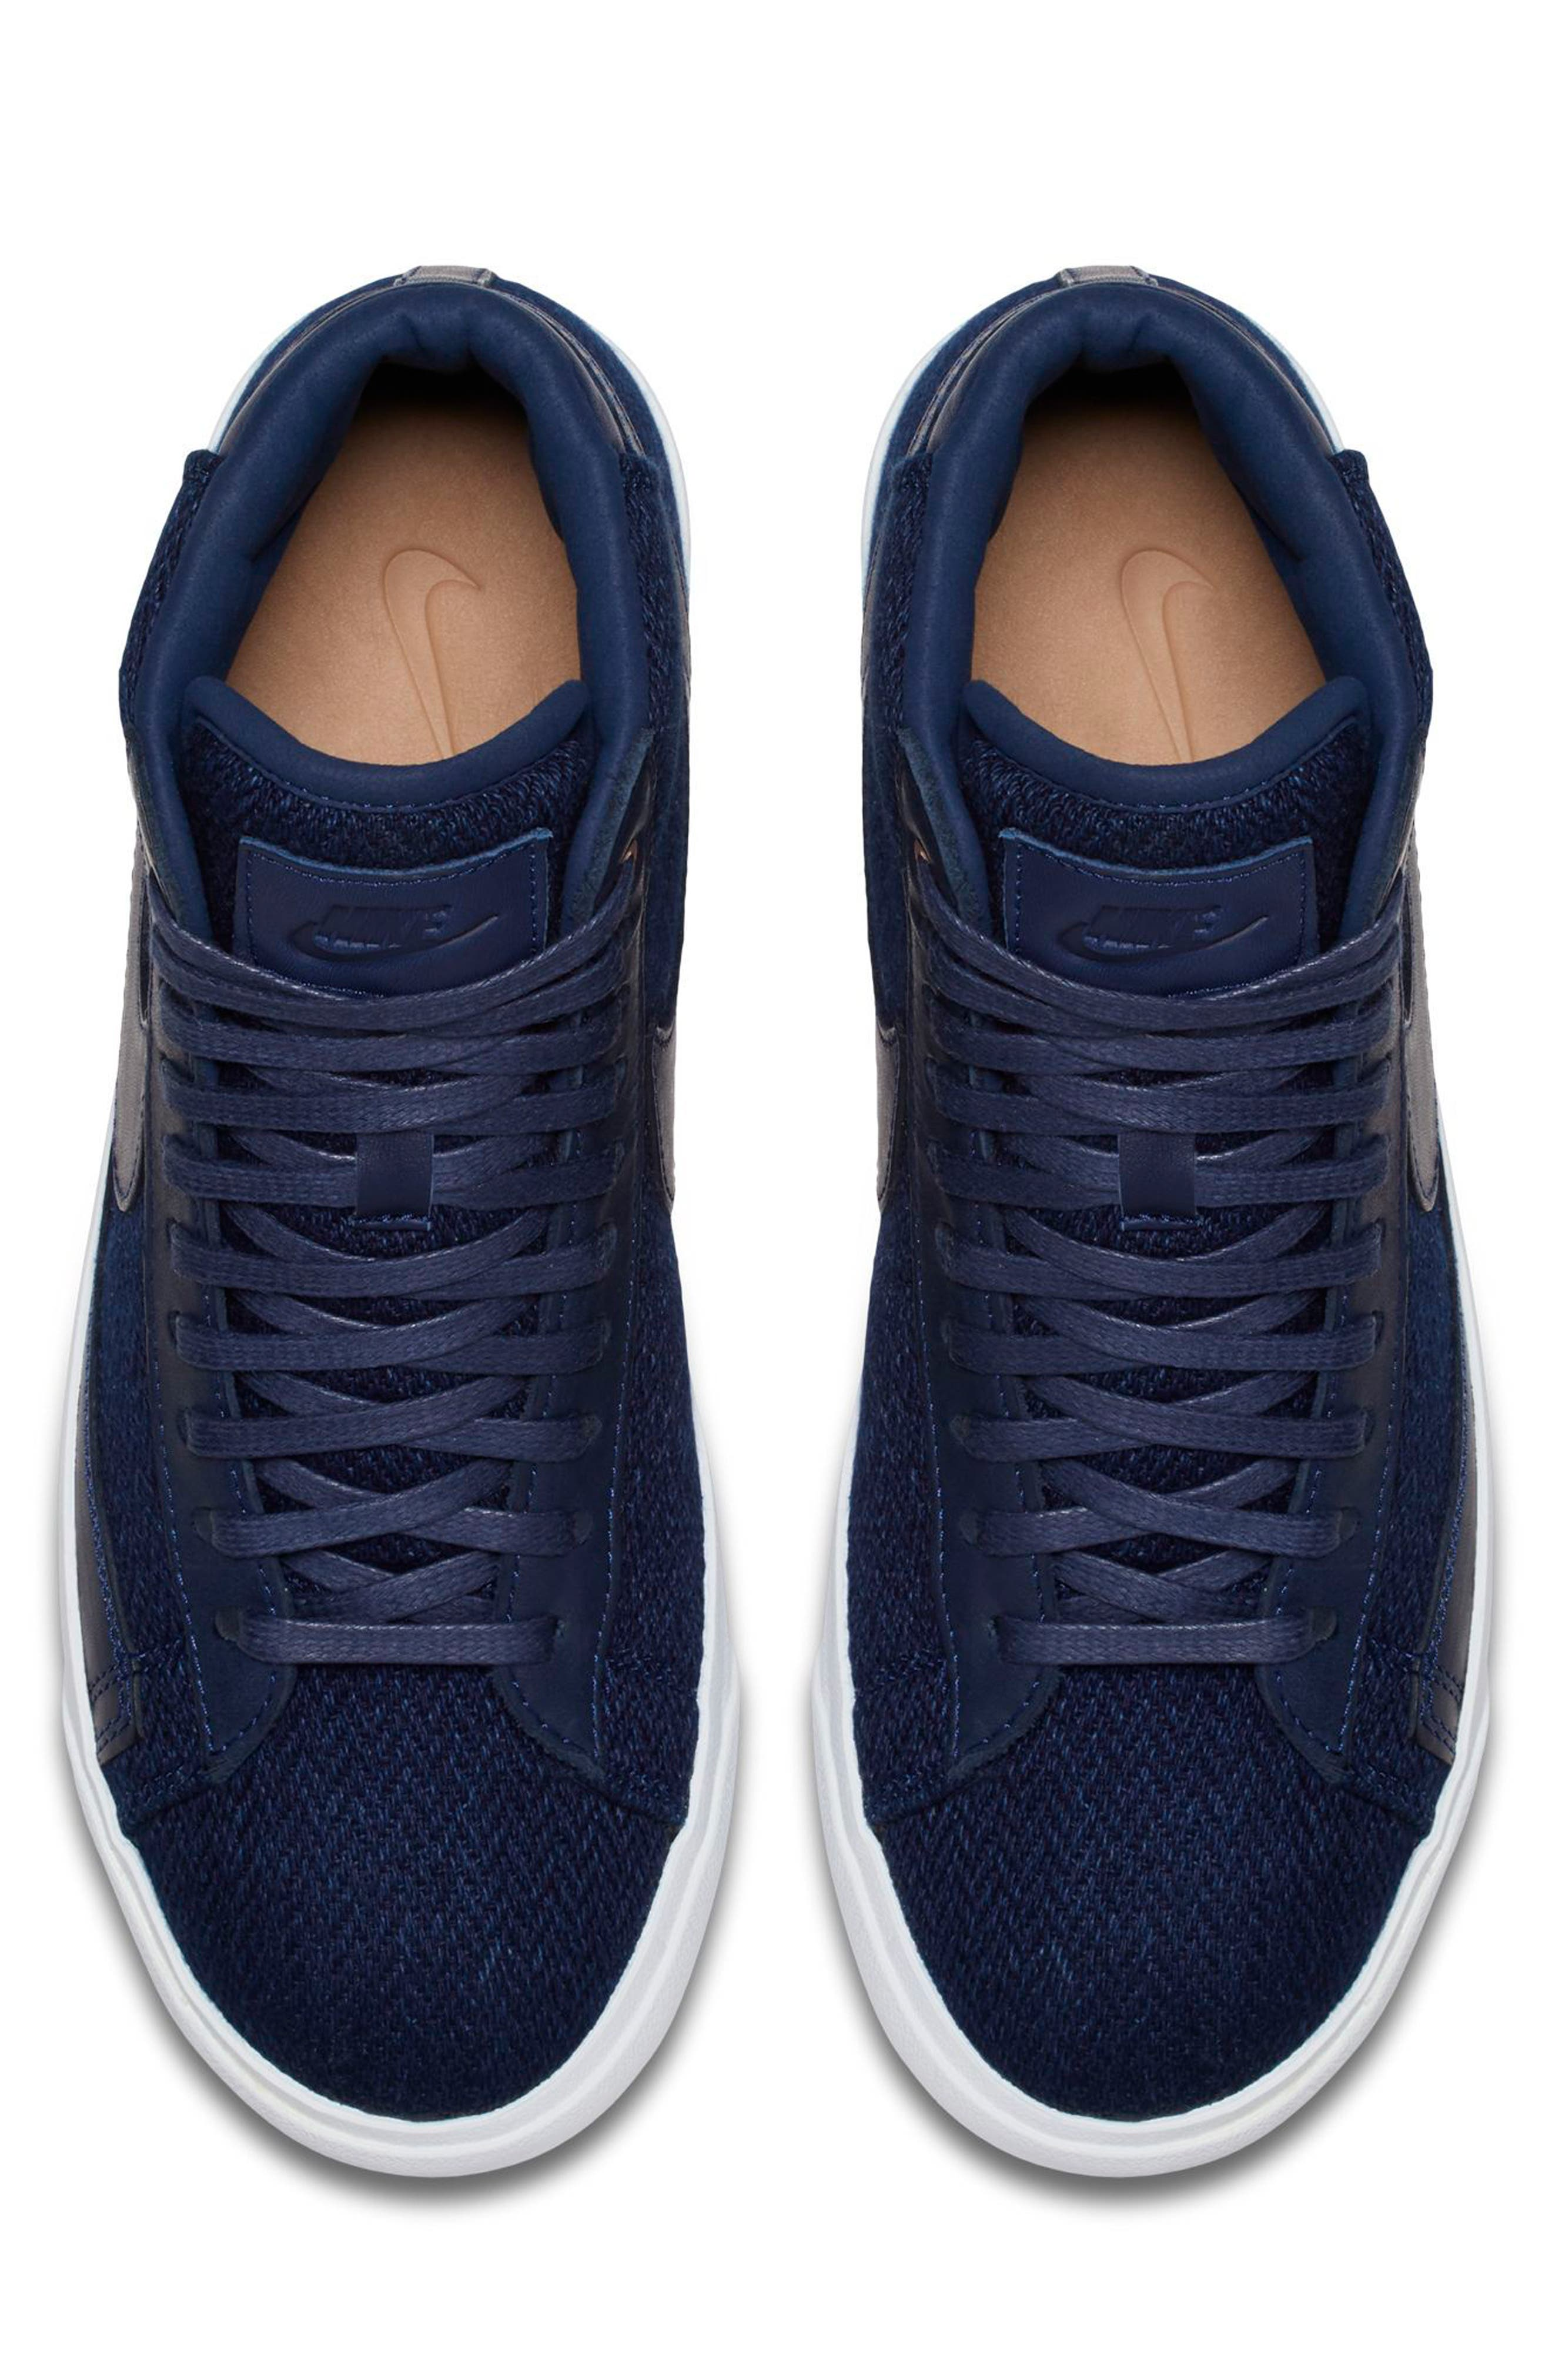 Blazer Mid Premium LX Sneaker,                             Alternate thumbnail 4, color,                             400